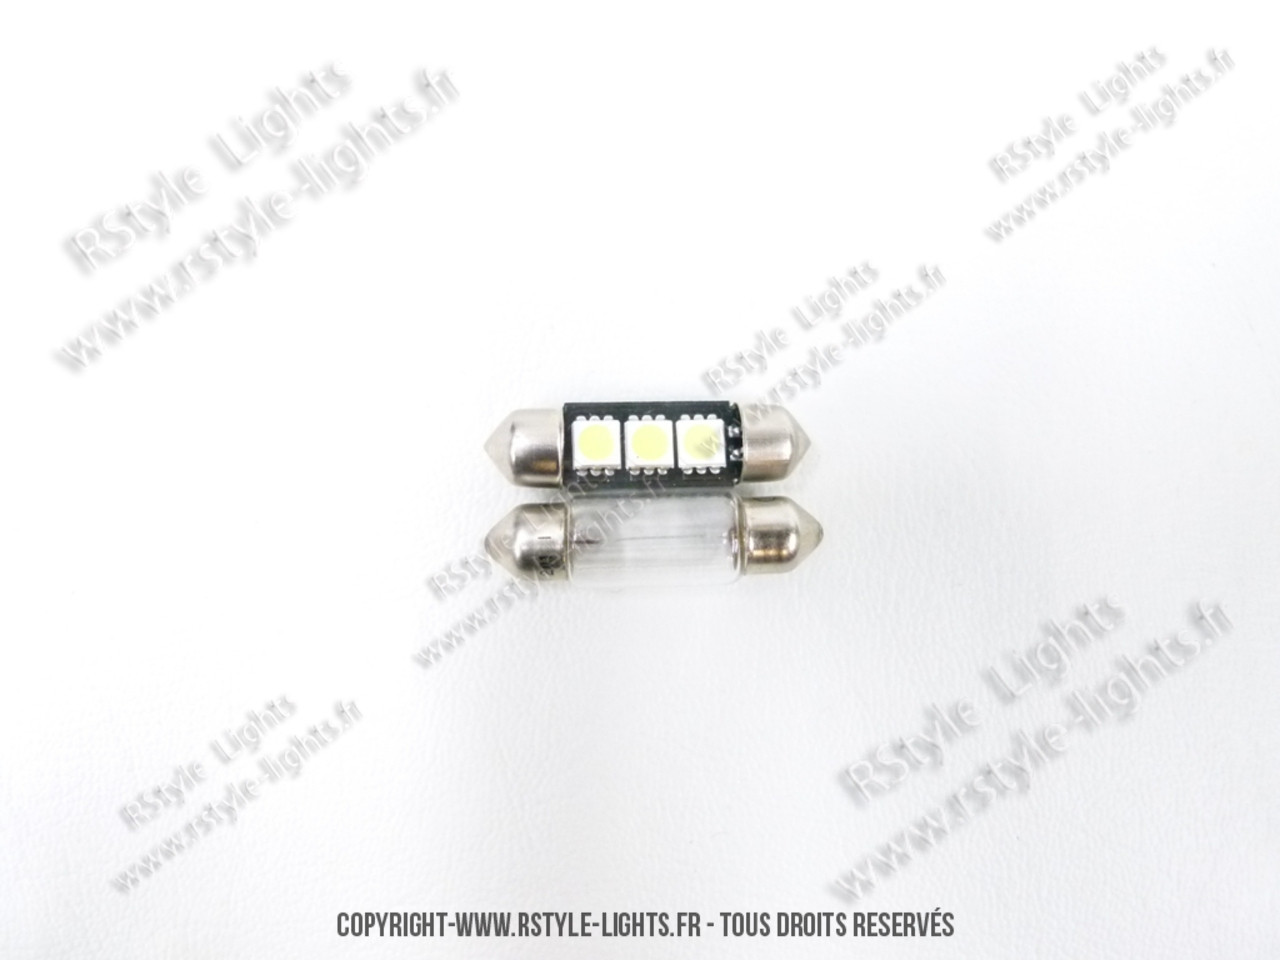 led navette c5w 36mm 37mm ampoule led voiture auto festoon soffite. Black Bedroom Furniture Sets. Home Design Ideas